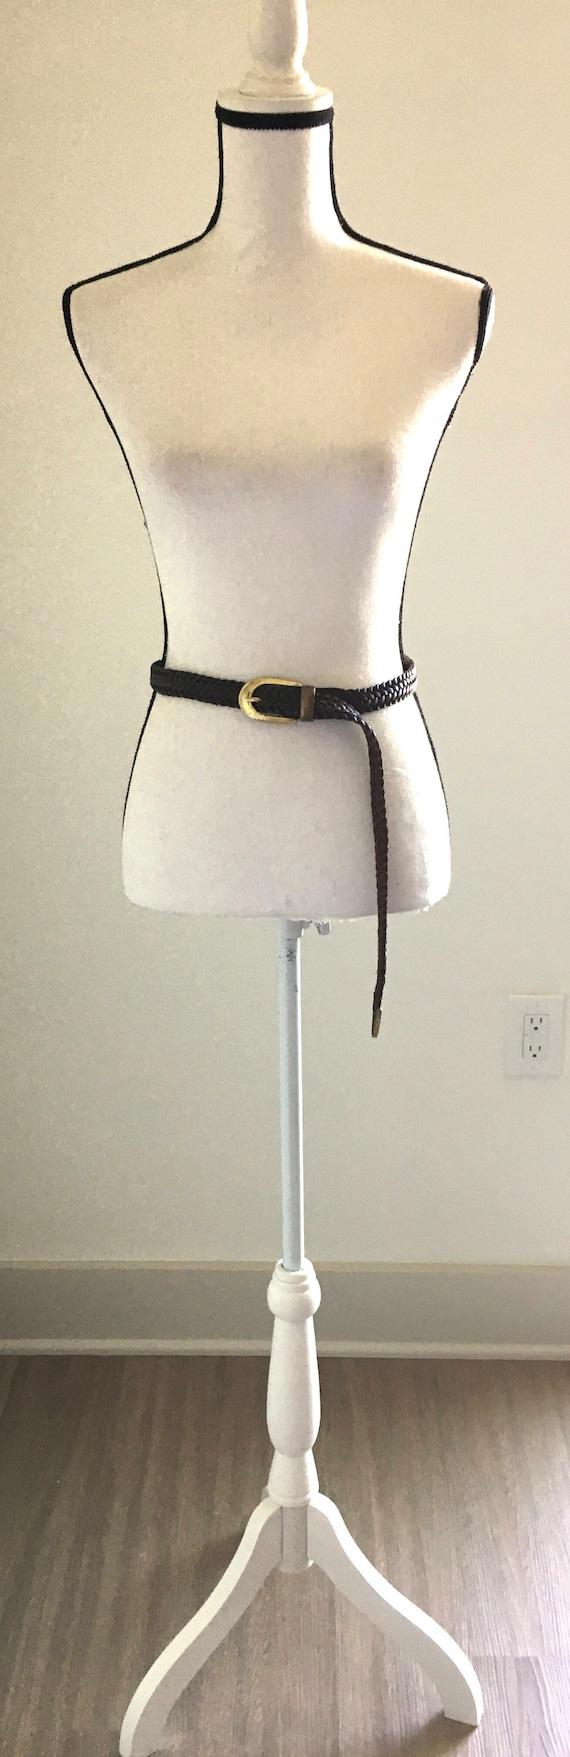 Vintage Capezio,1980s Woven Leather Belt,1980s Bro